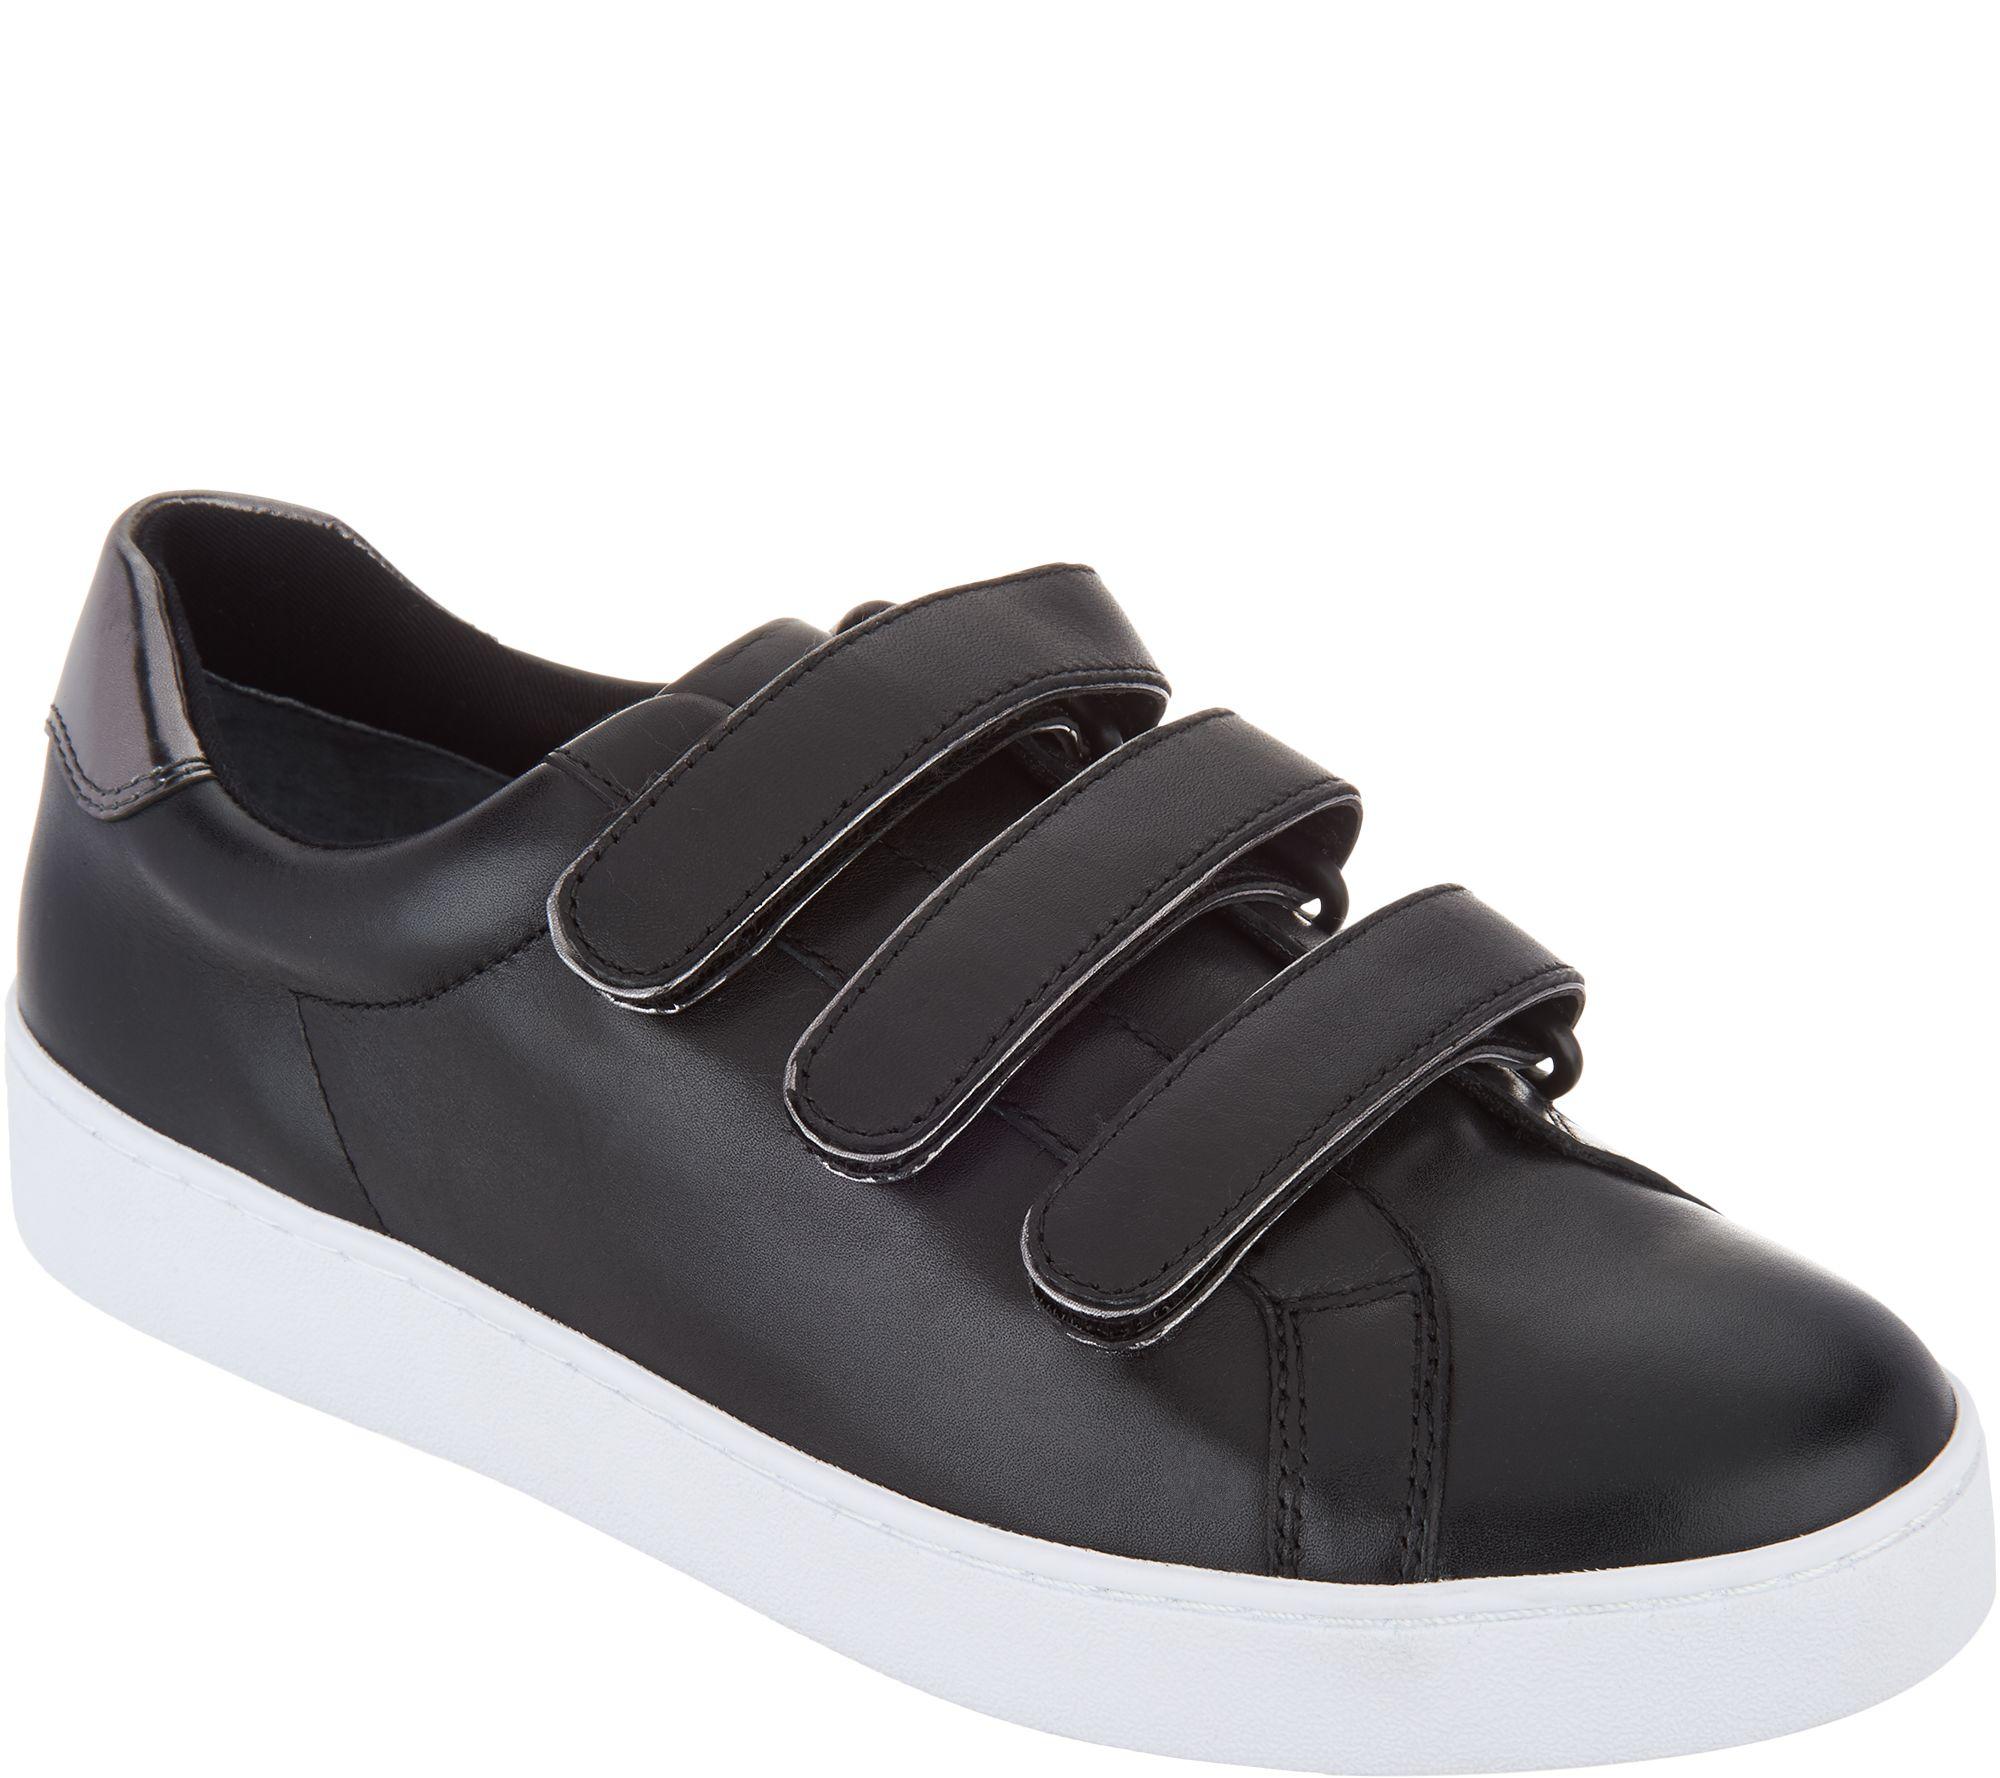 a483d505a98bb Vionic Leather Sneakers - Bobbi - Page 1 — QVC.com